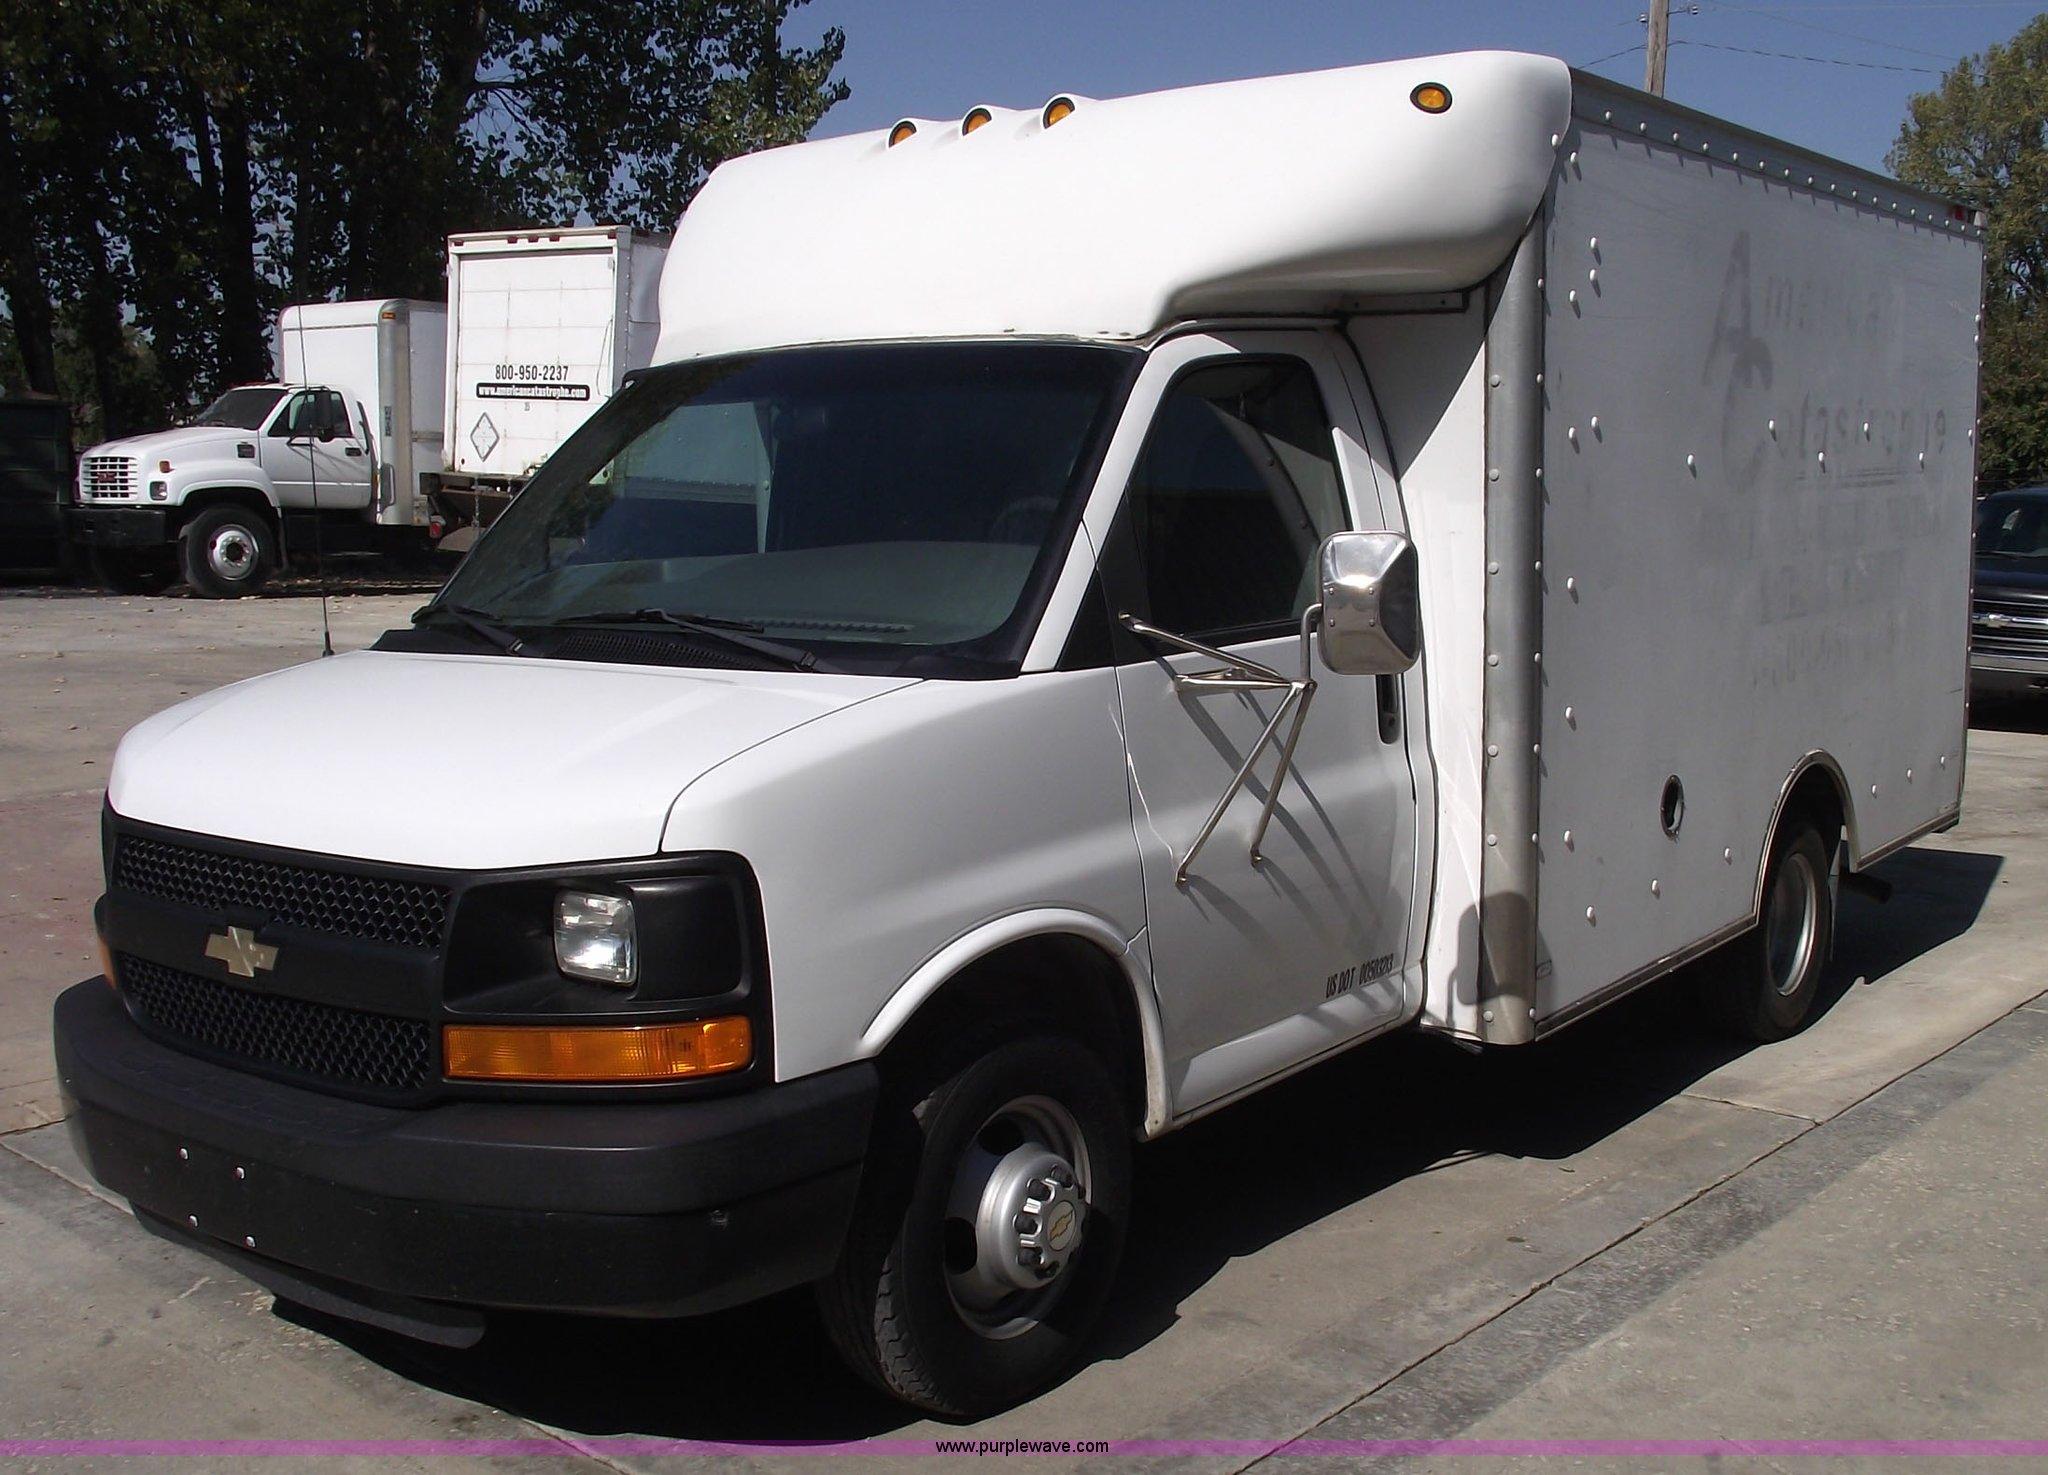 2c6a61568d 2003 Chevrolet Express G30 box van truck for sale in Kansas